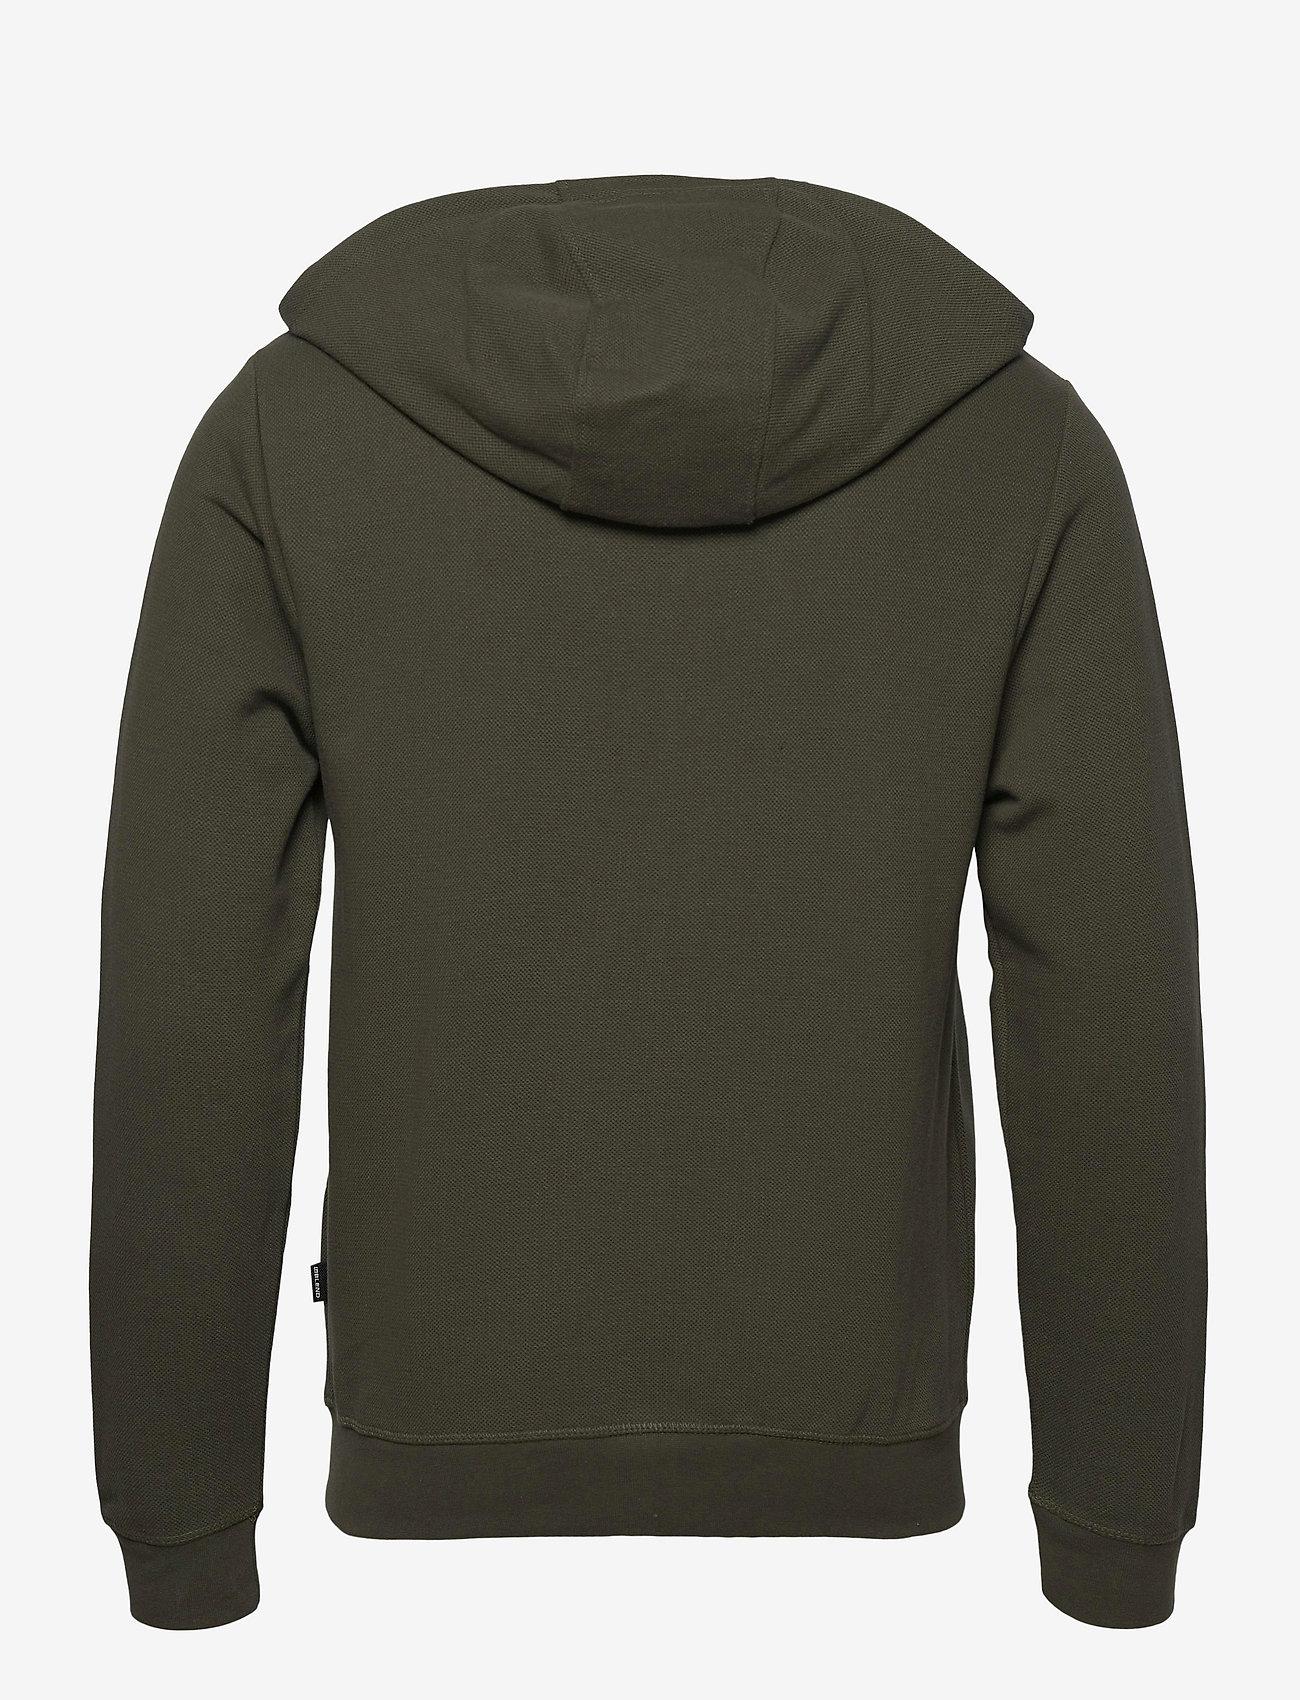 Blend - Sweatshirt - basic sweatshirts - forest night - 1